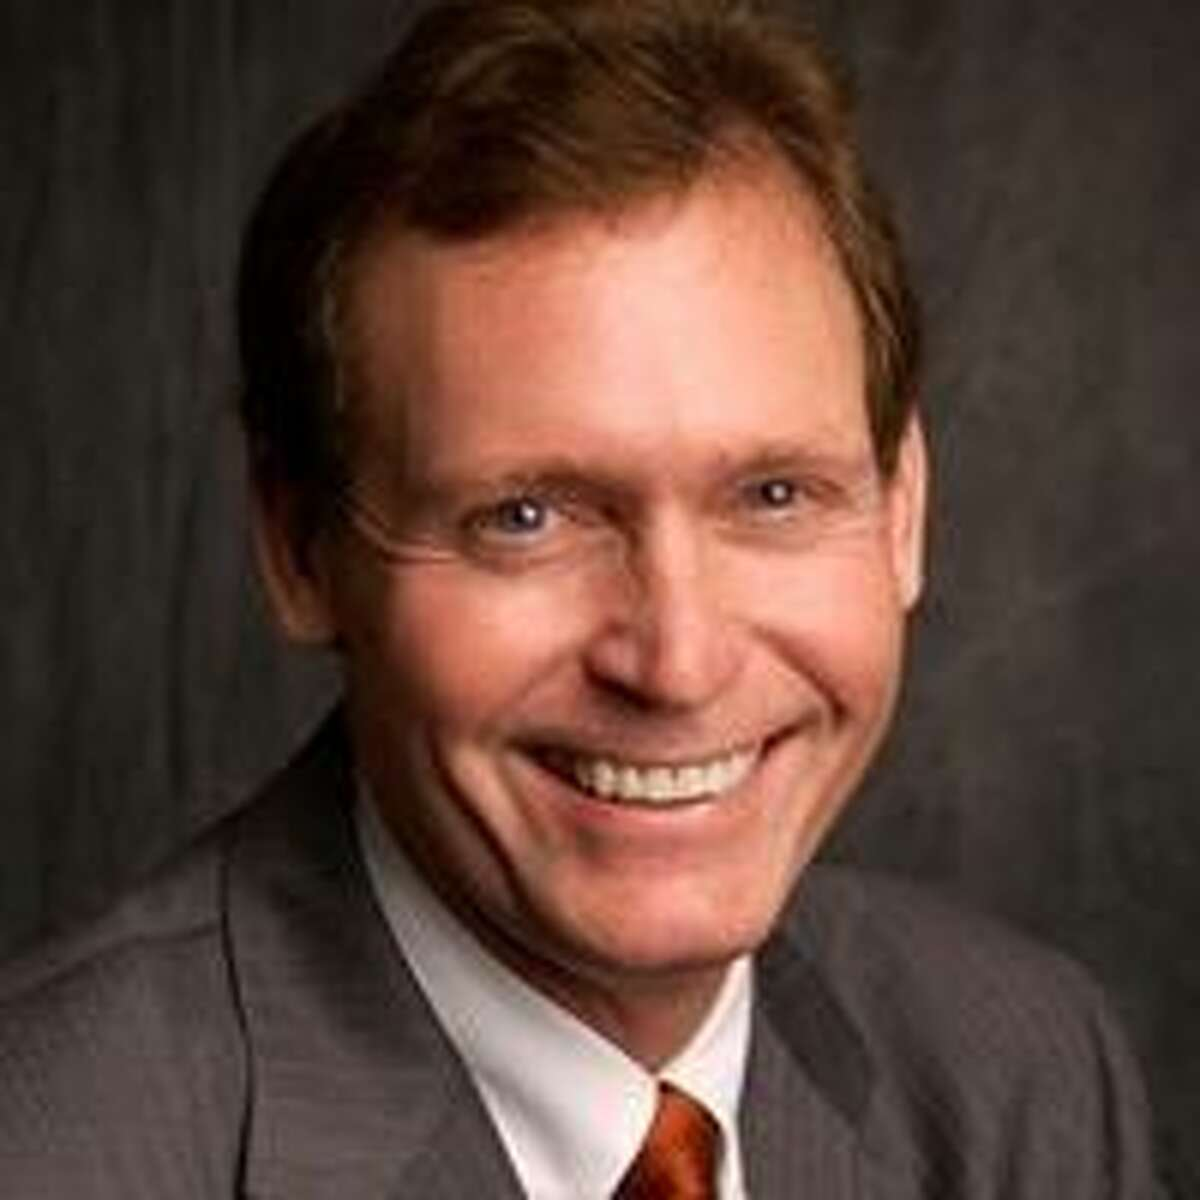 State Representative John Zerwas, M.D